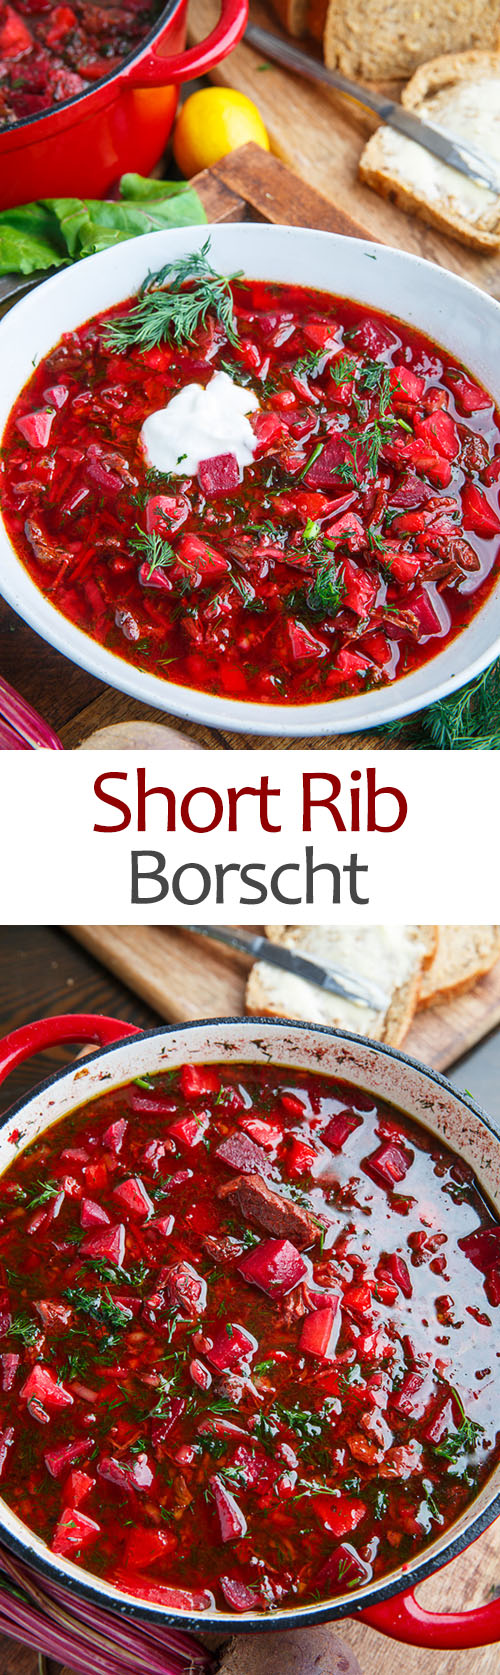 Beef Short Rib Borscht